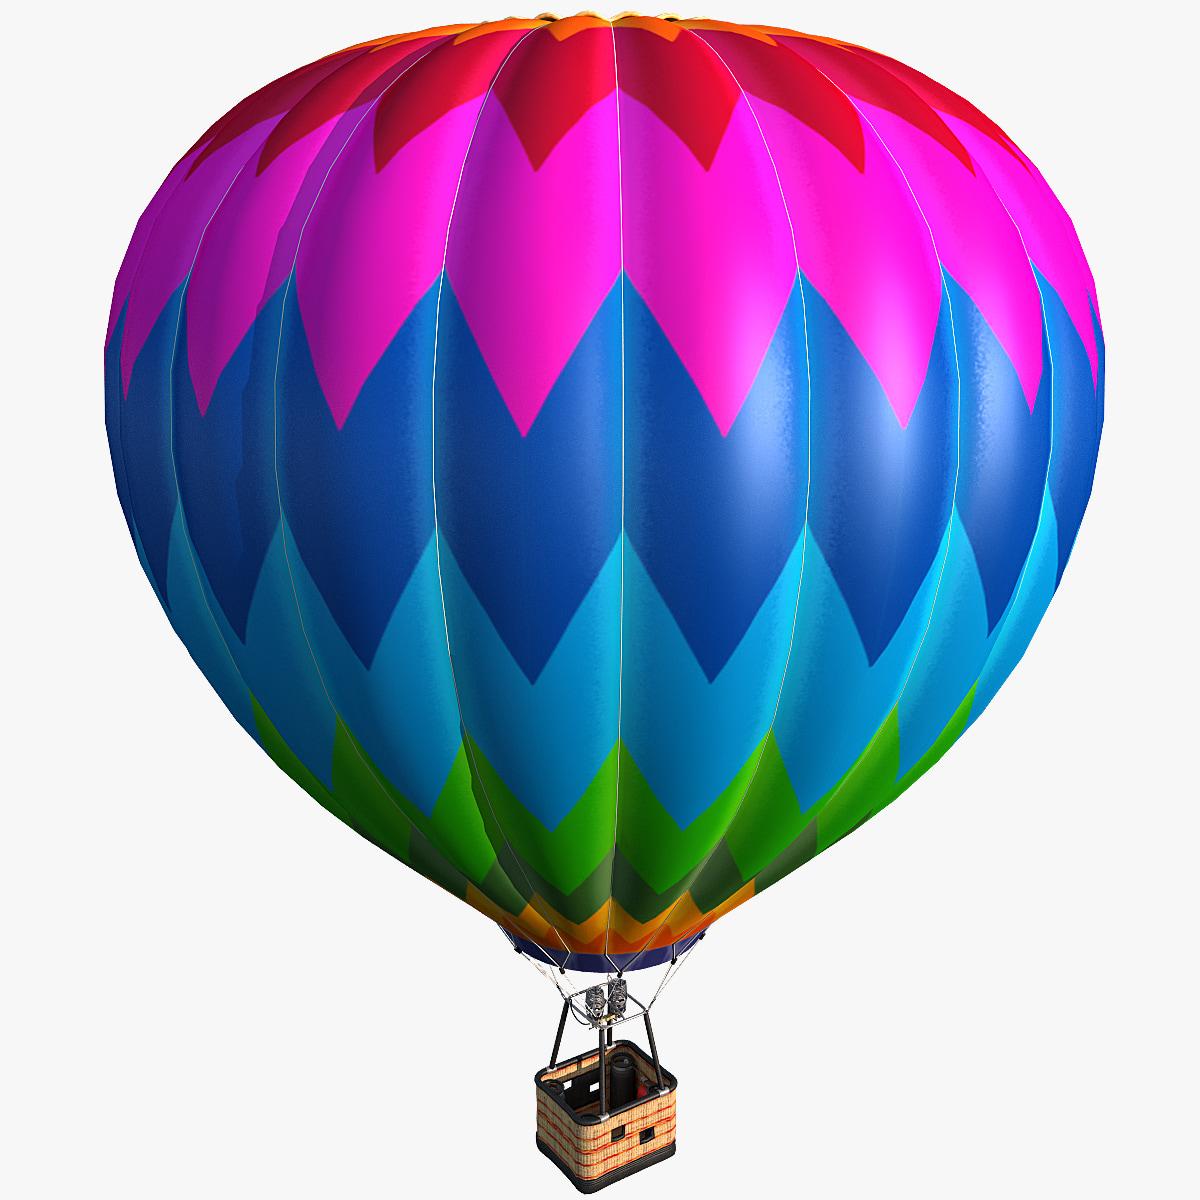 Air_Balloon_V3_Vray_0002_1.jpg